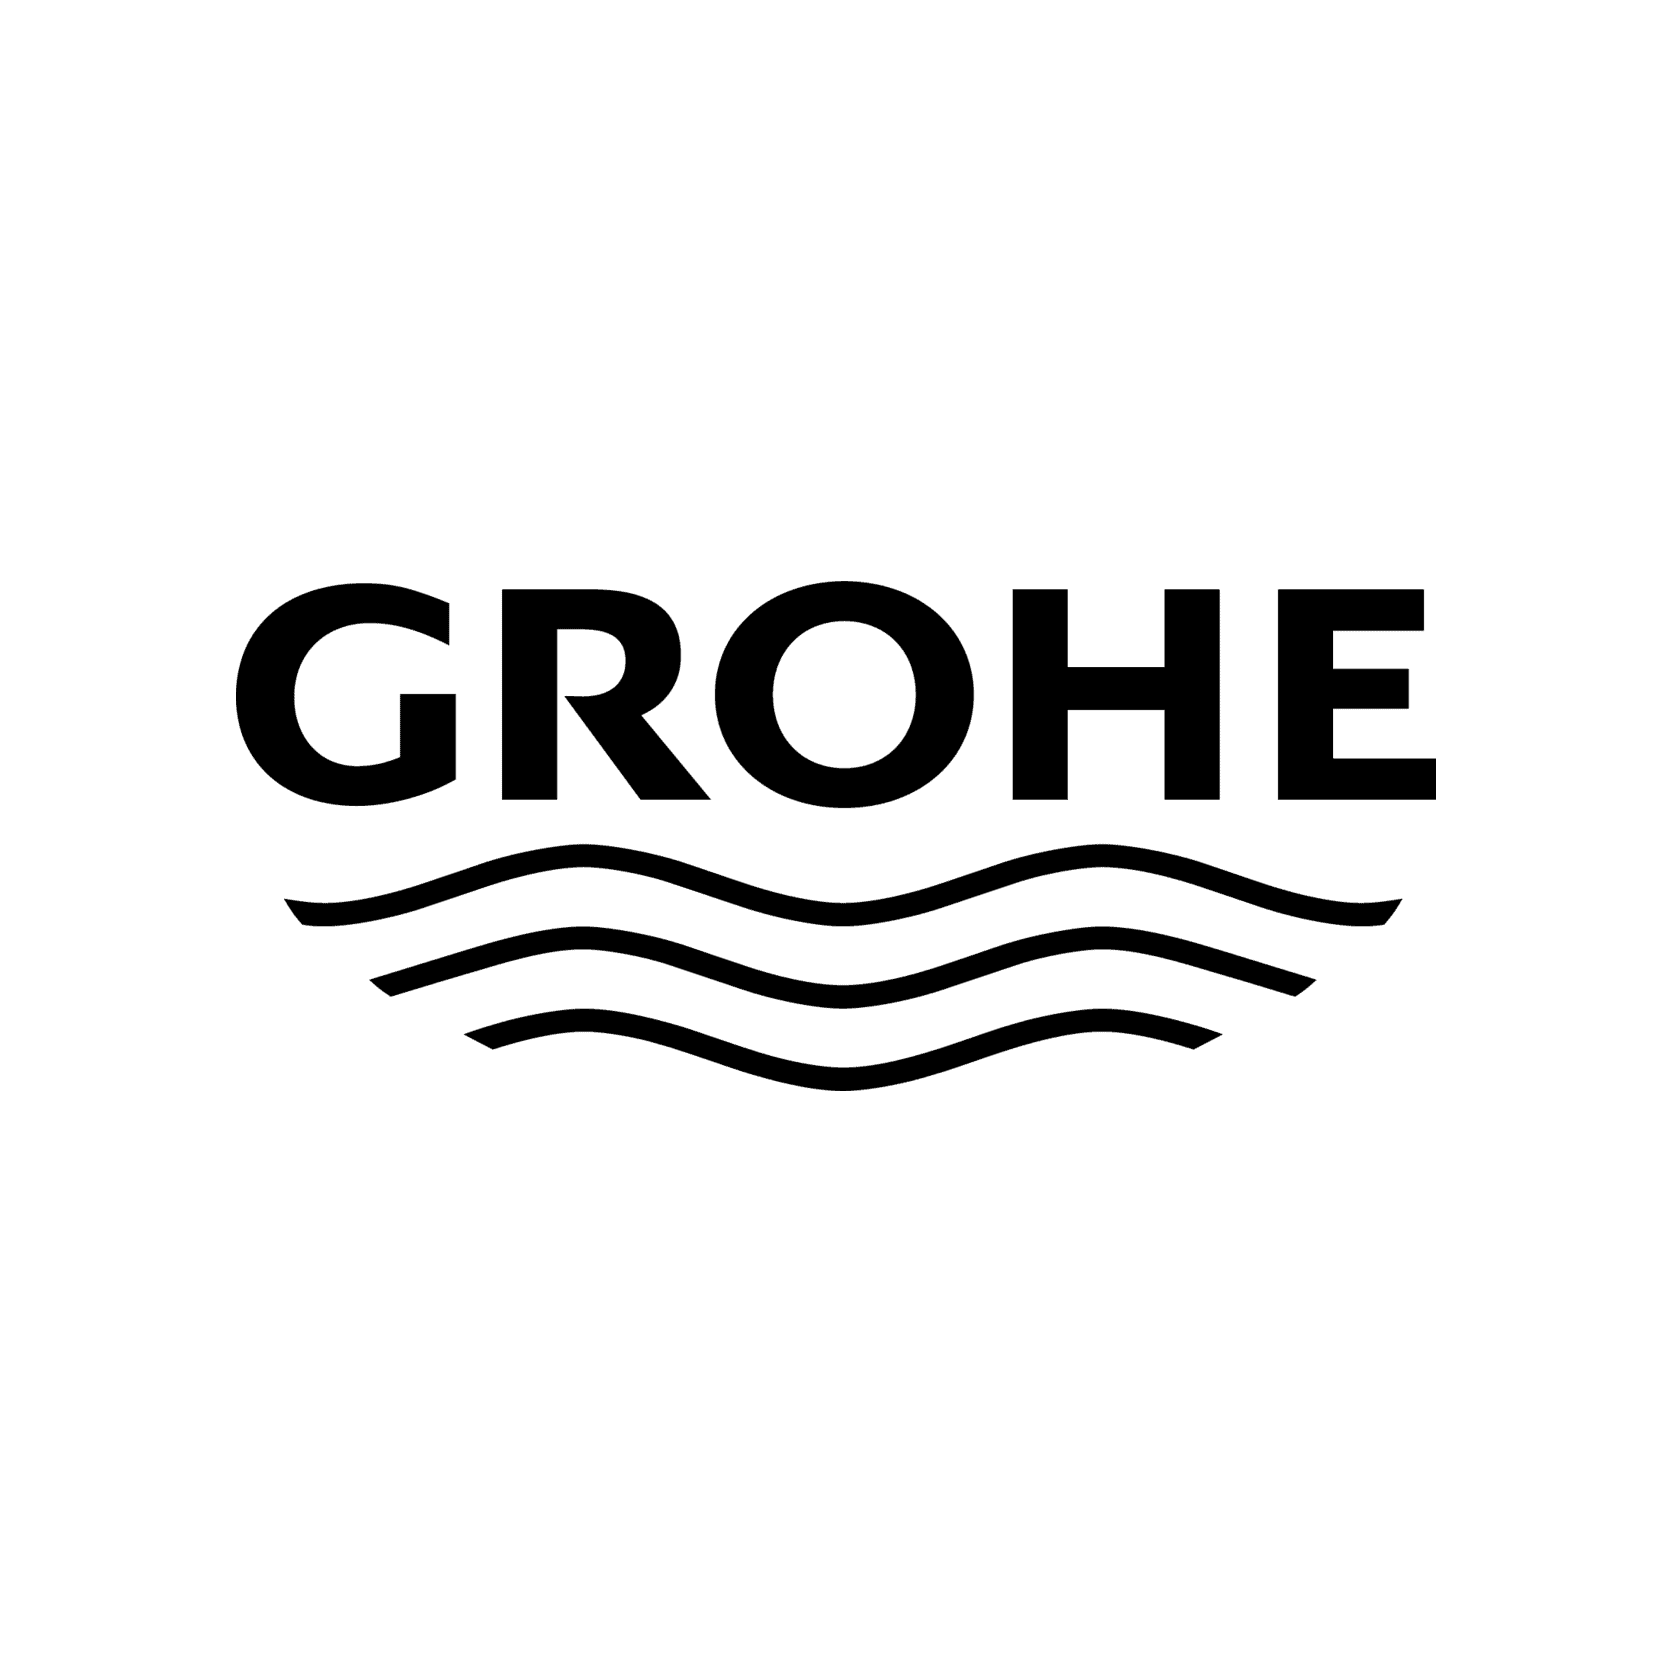 11_Grohe-logo